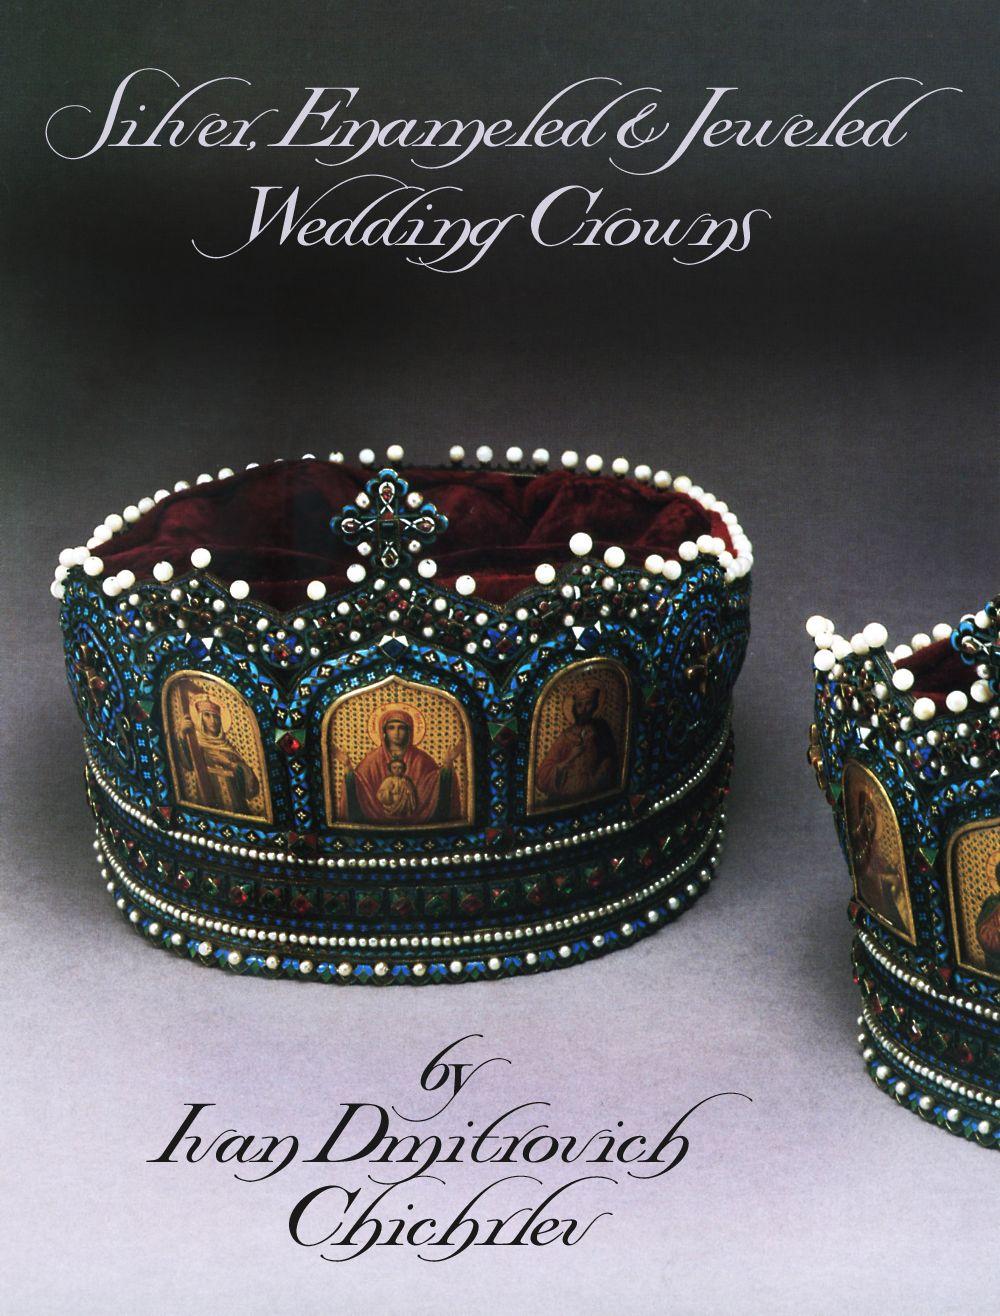 Russian silver, enamel & gem-set WEDDING CROWNS created by Ivan Dmitrovich Chichrlev. 19th Century. Christian Orlov photo Collection & retouching.